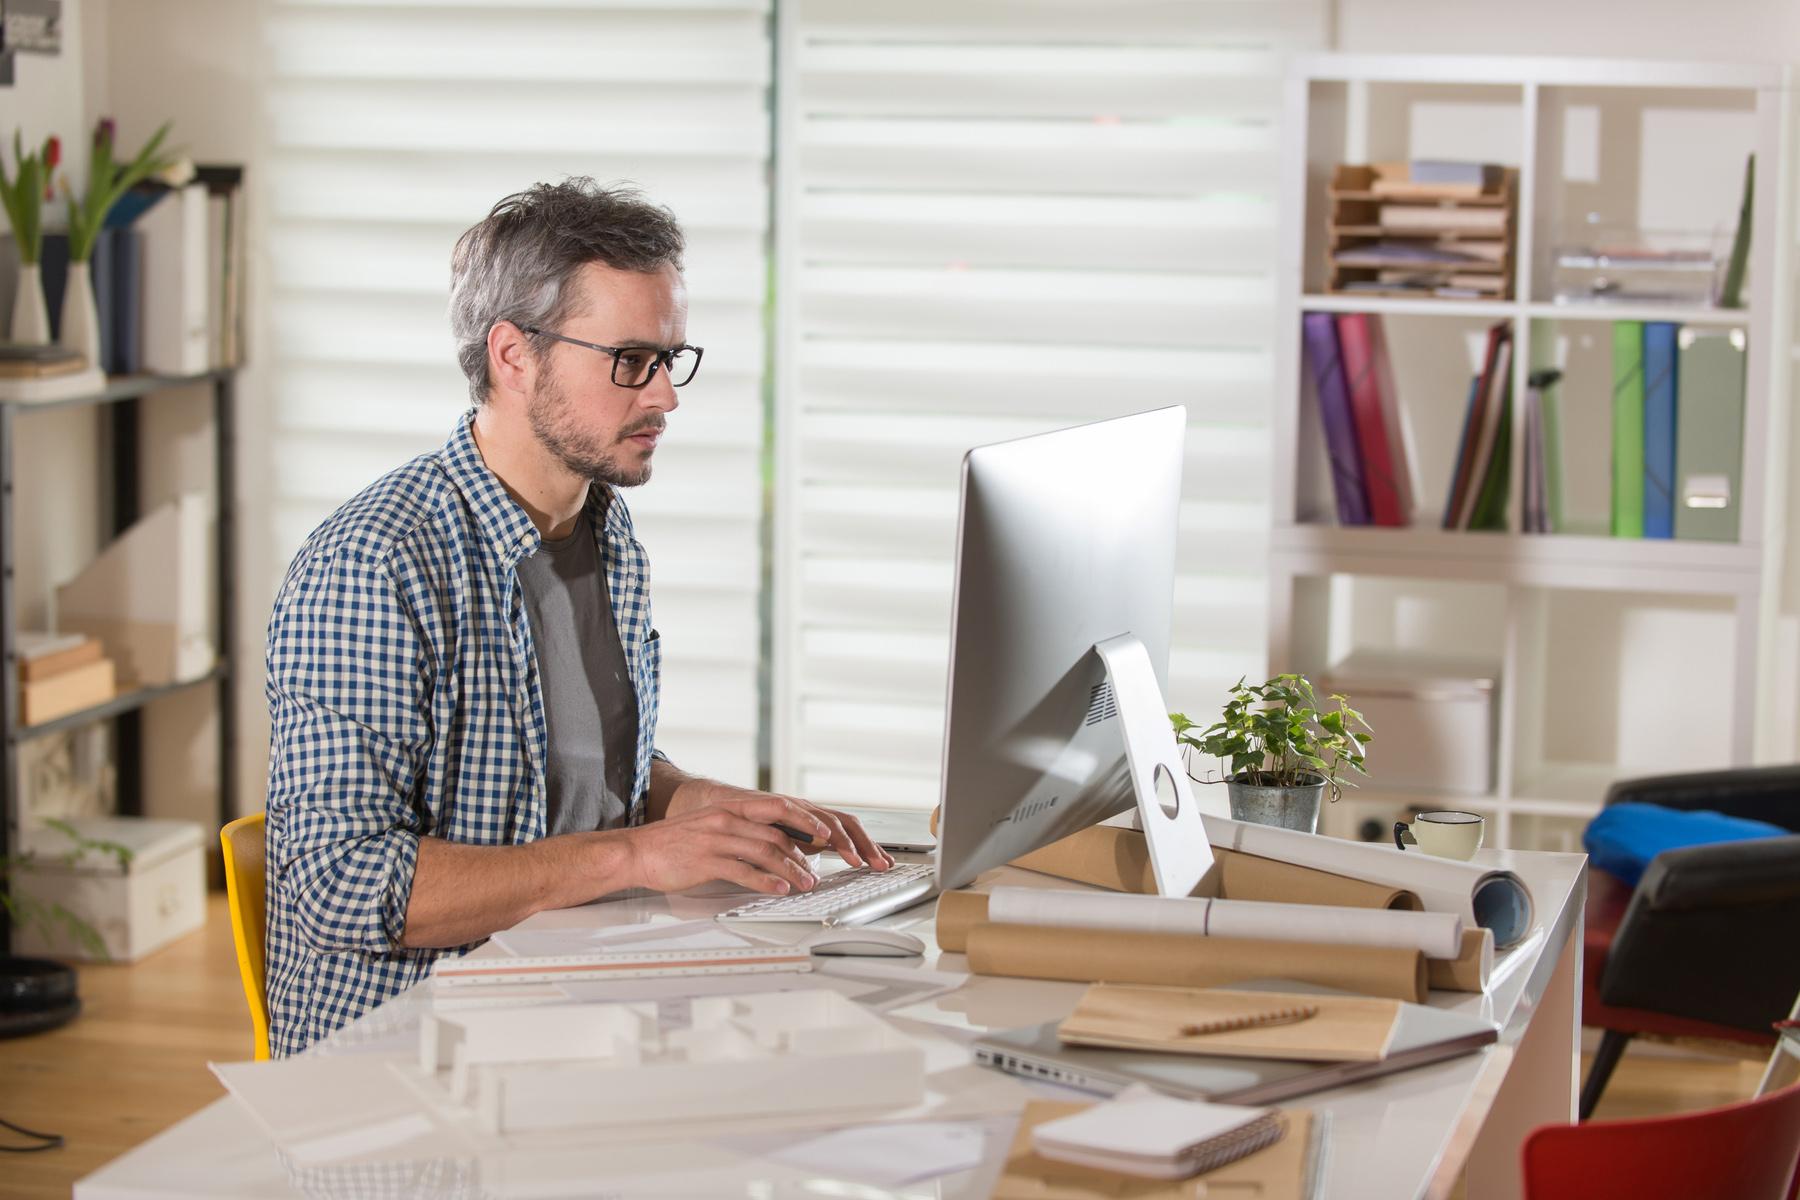 Entrepreneur working at his computer